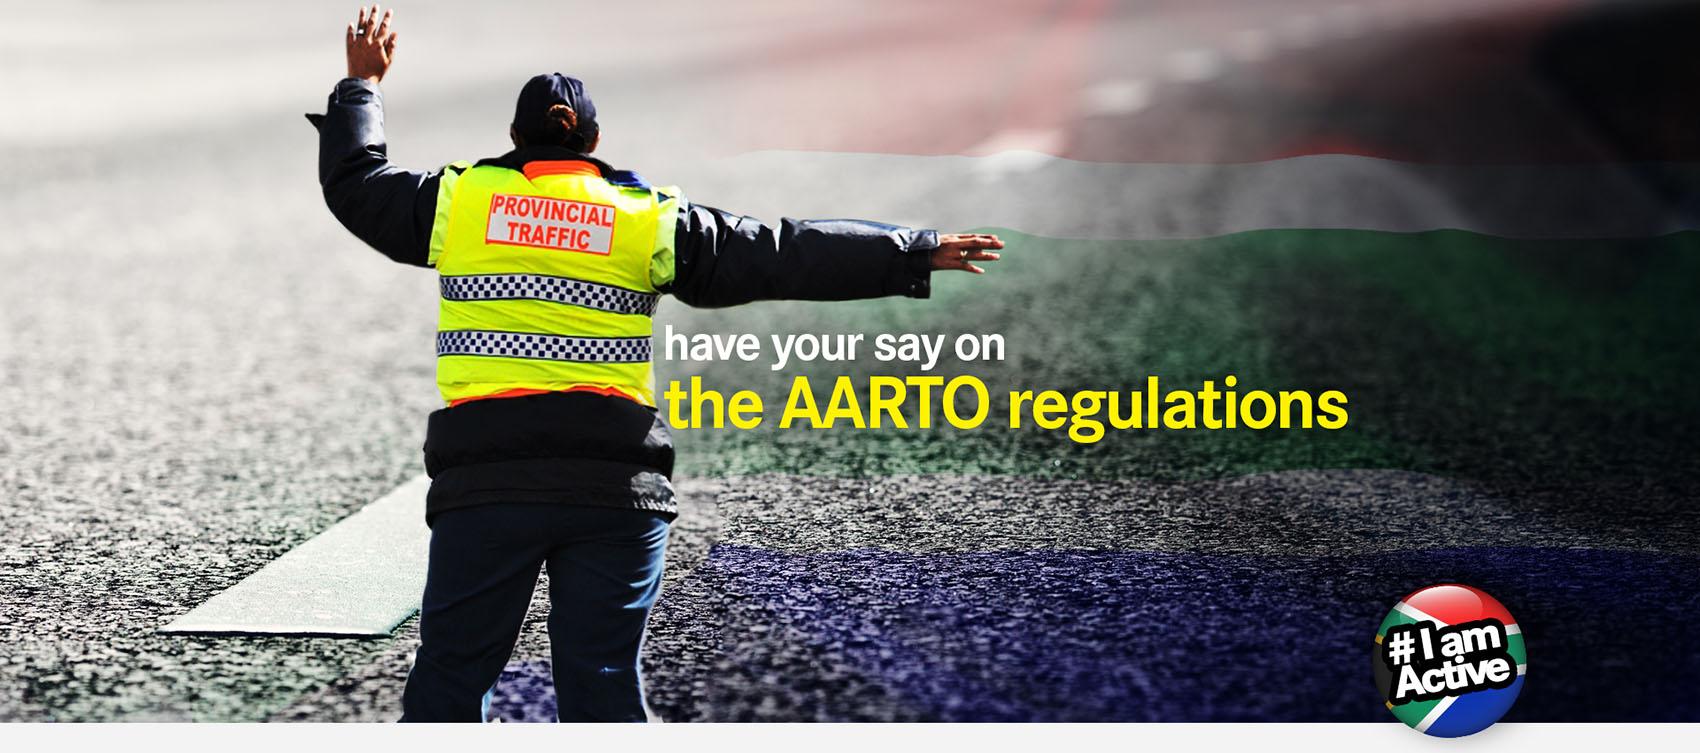 AARTO-regulations-DearSA